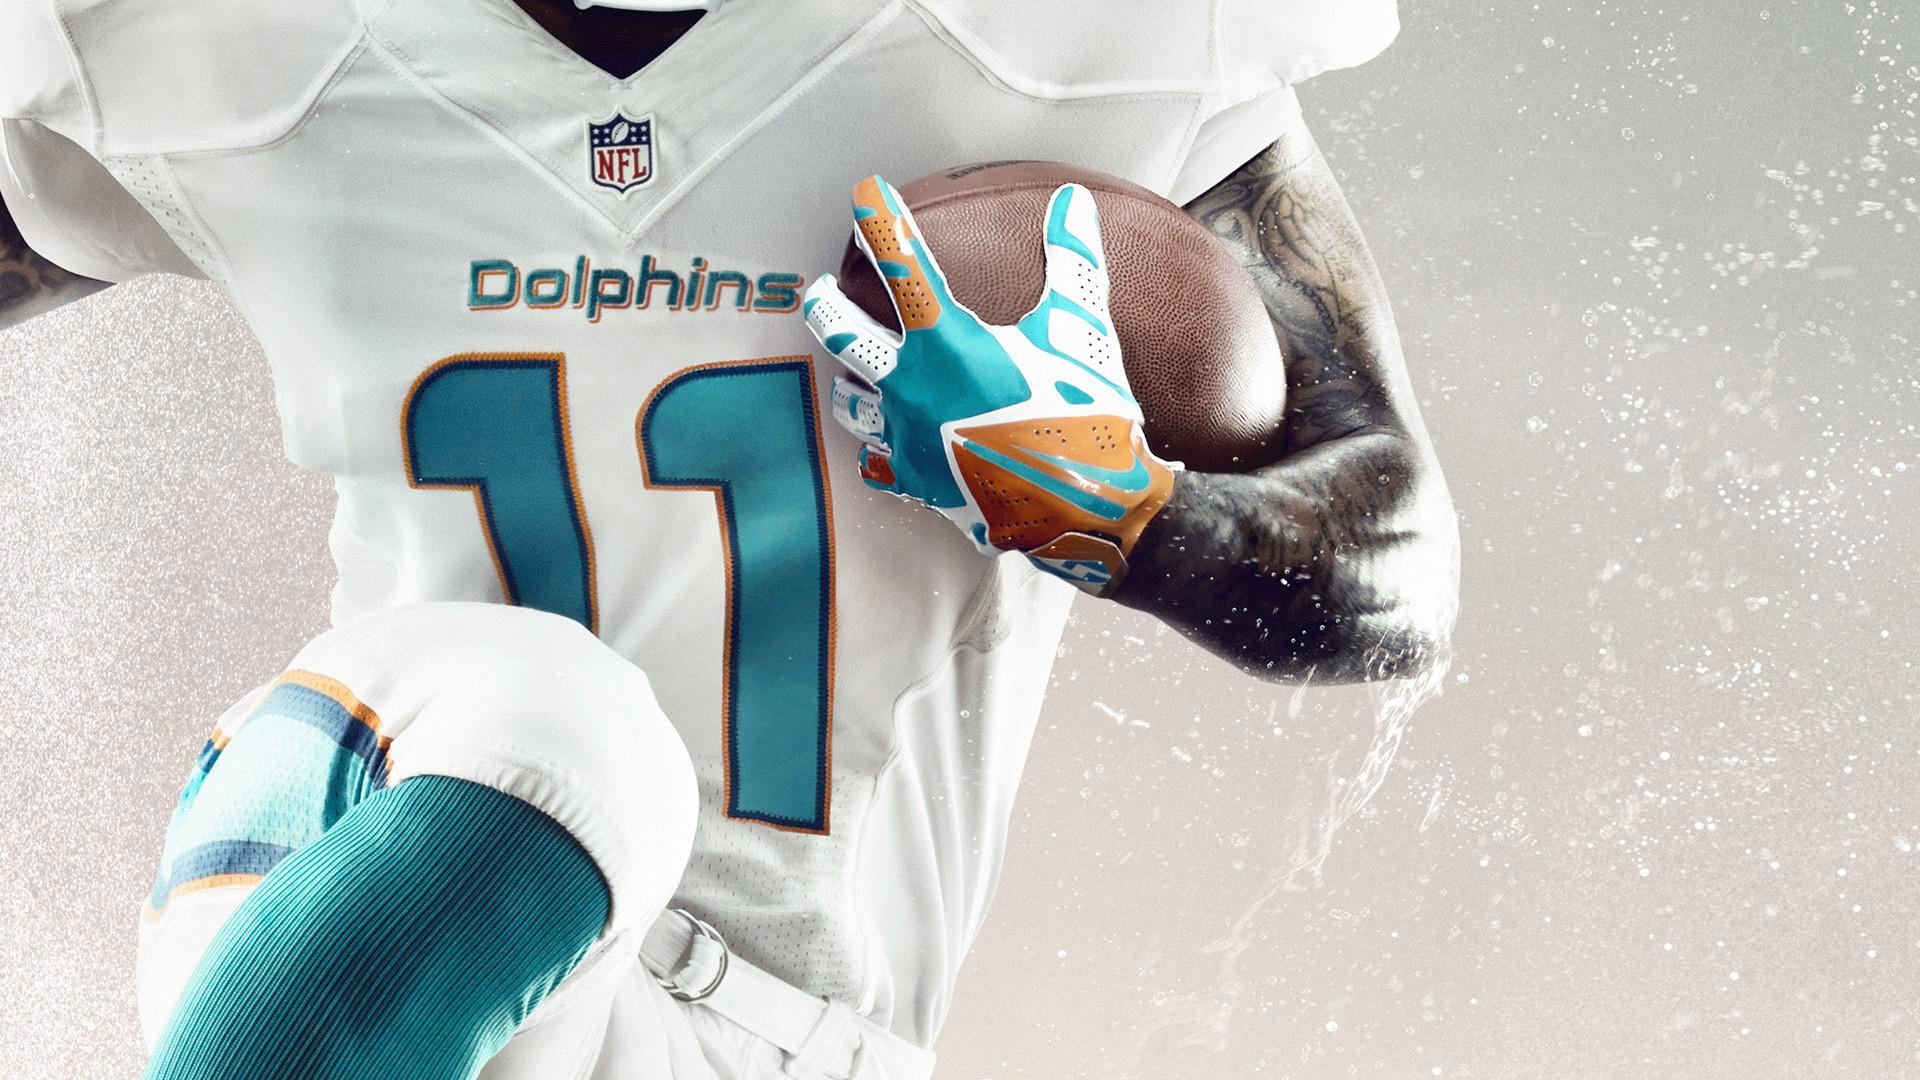 miami dolphins desktop wallpaper – photo #10